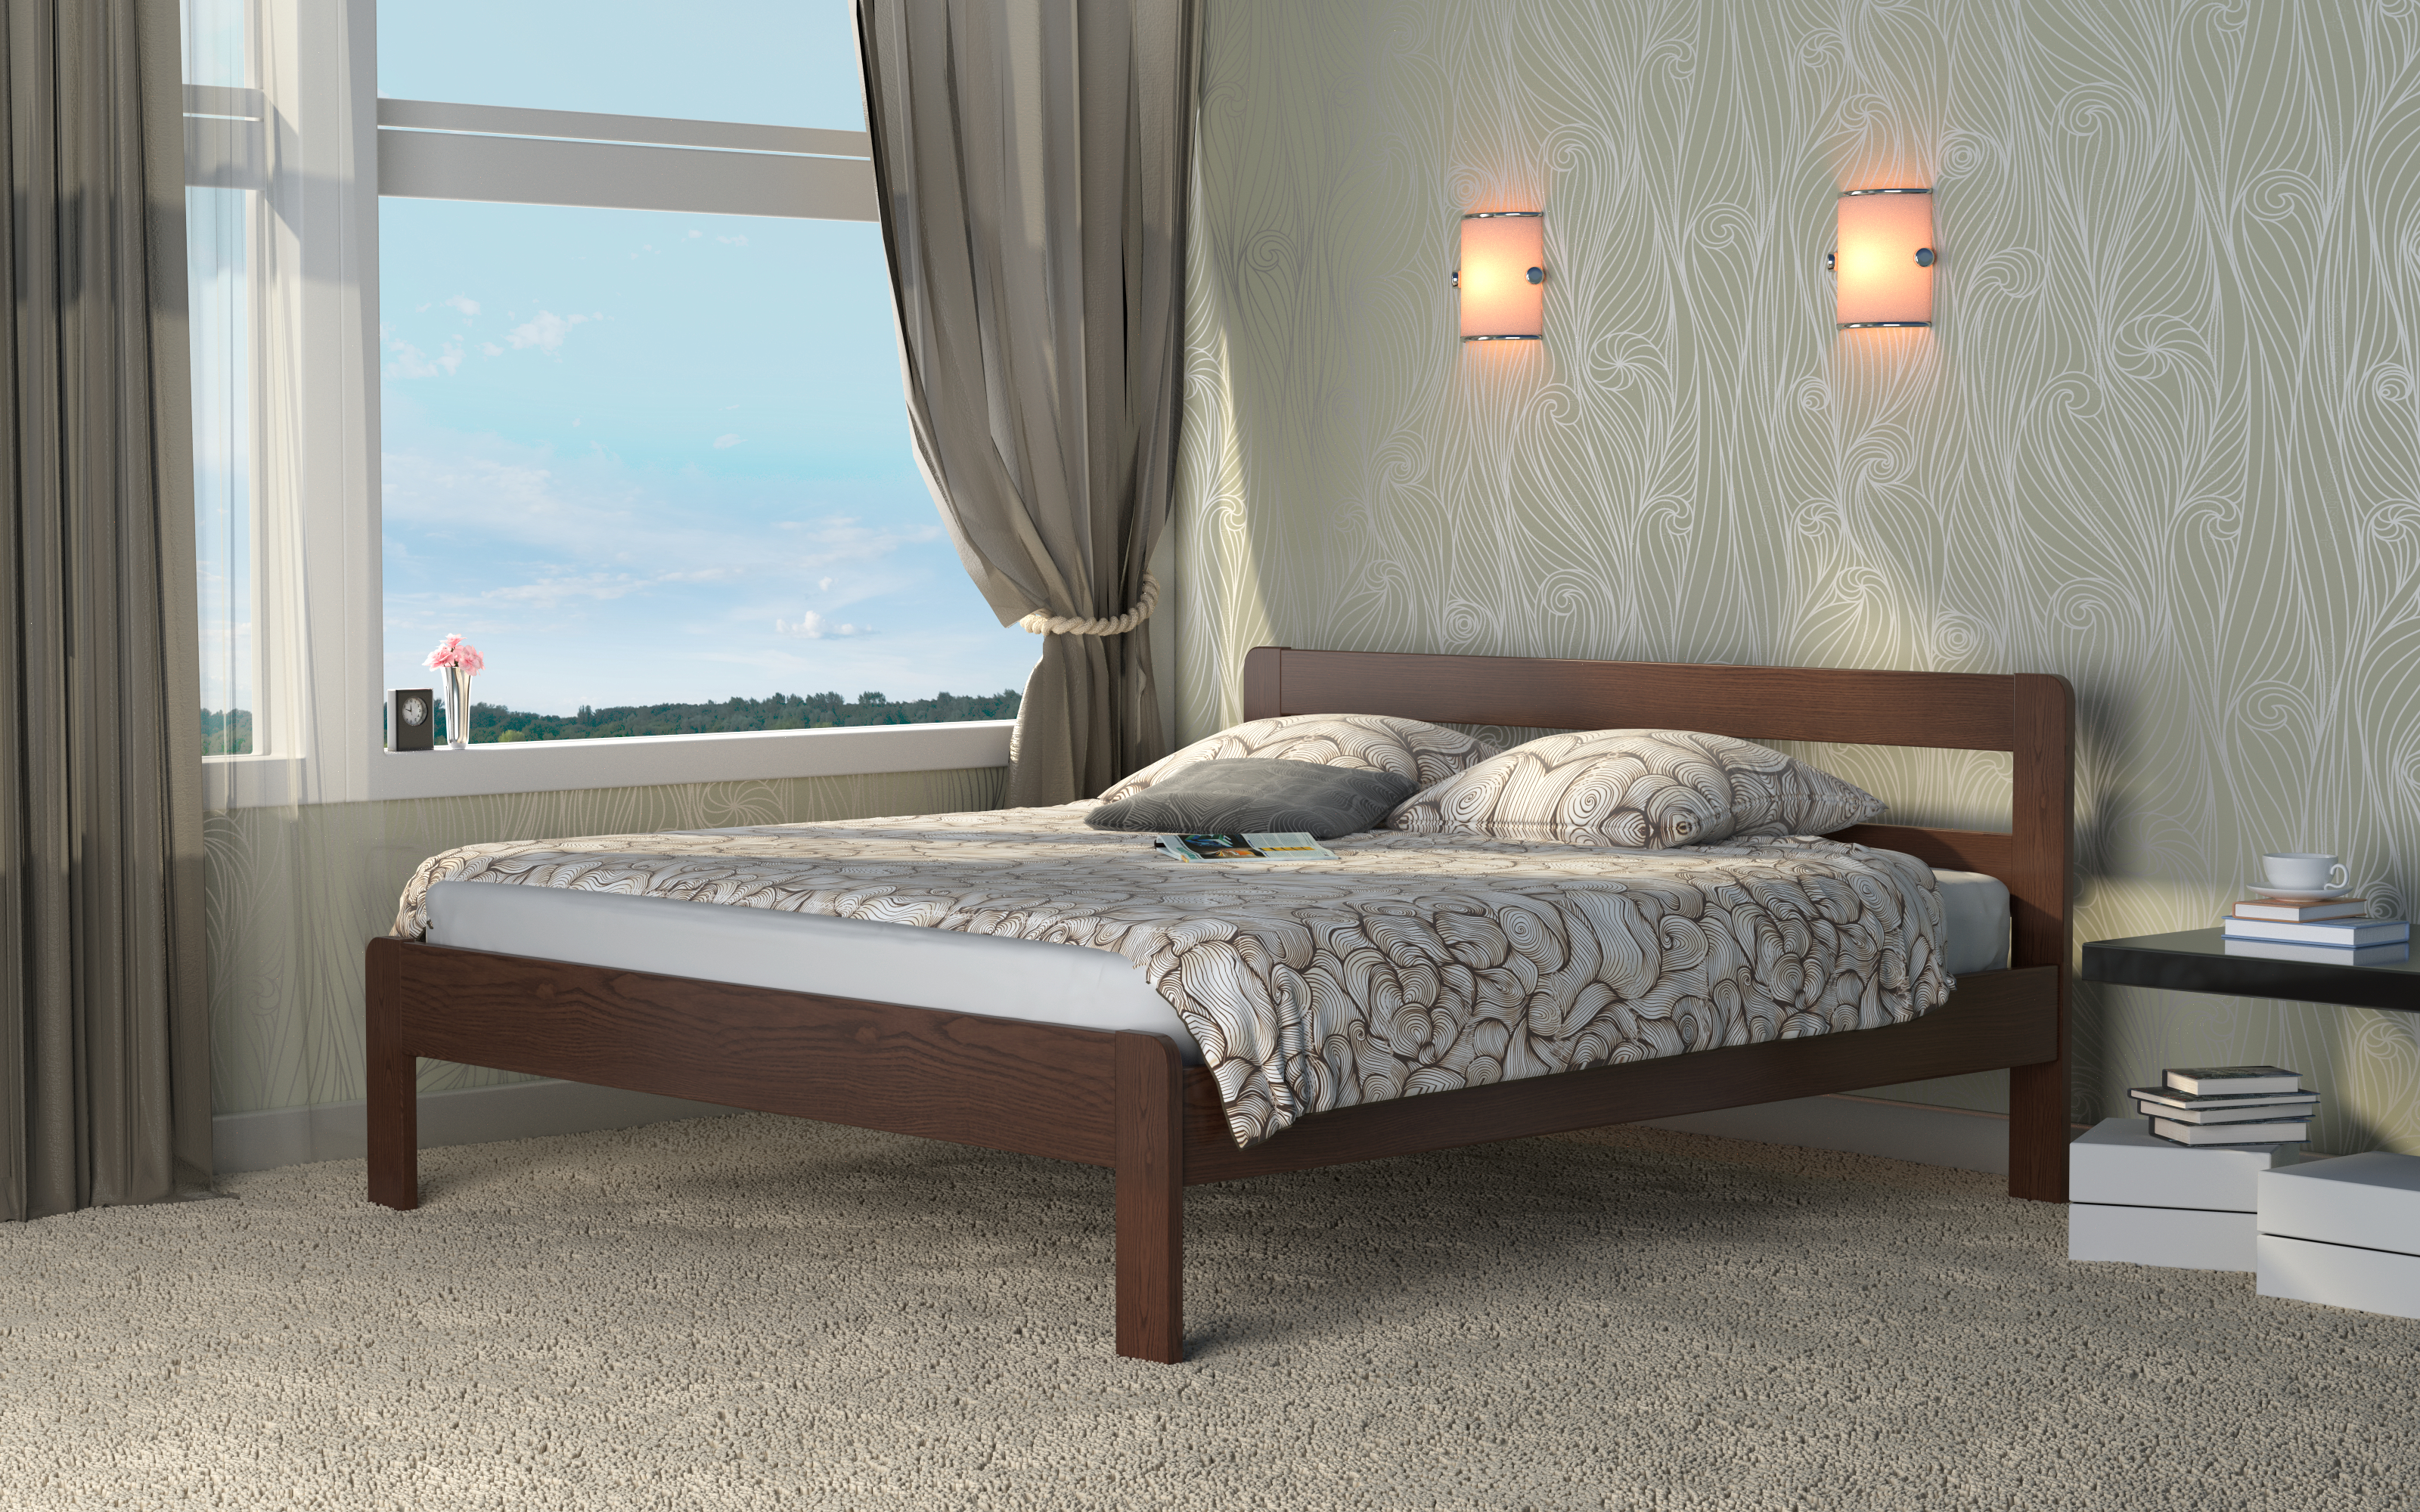 Кровать DreamLine Кредо 1 (Ясень) Кровать Кредо 1 (Ясень) фото